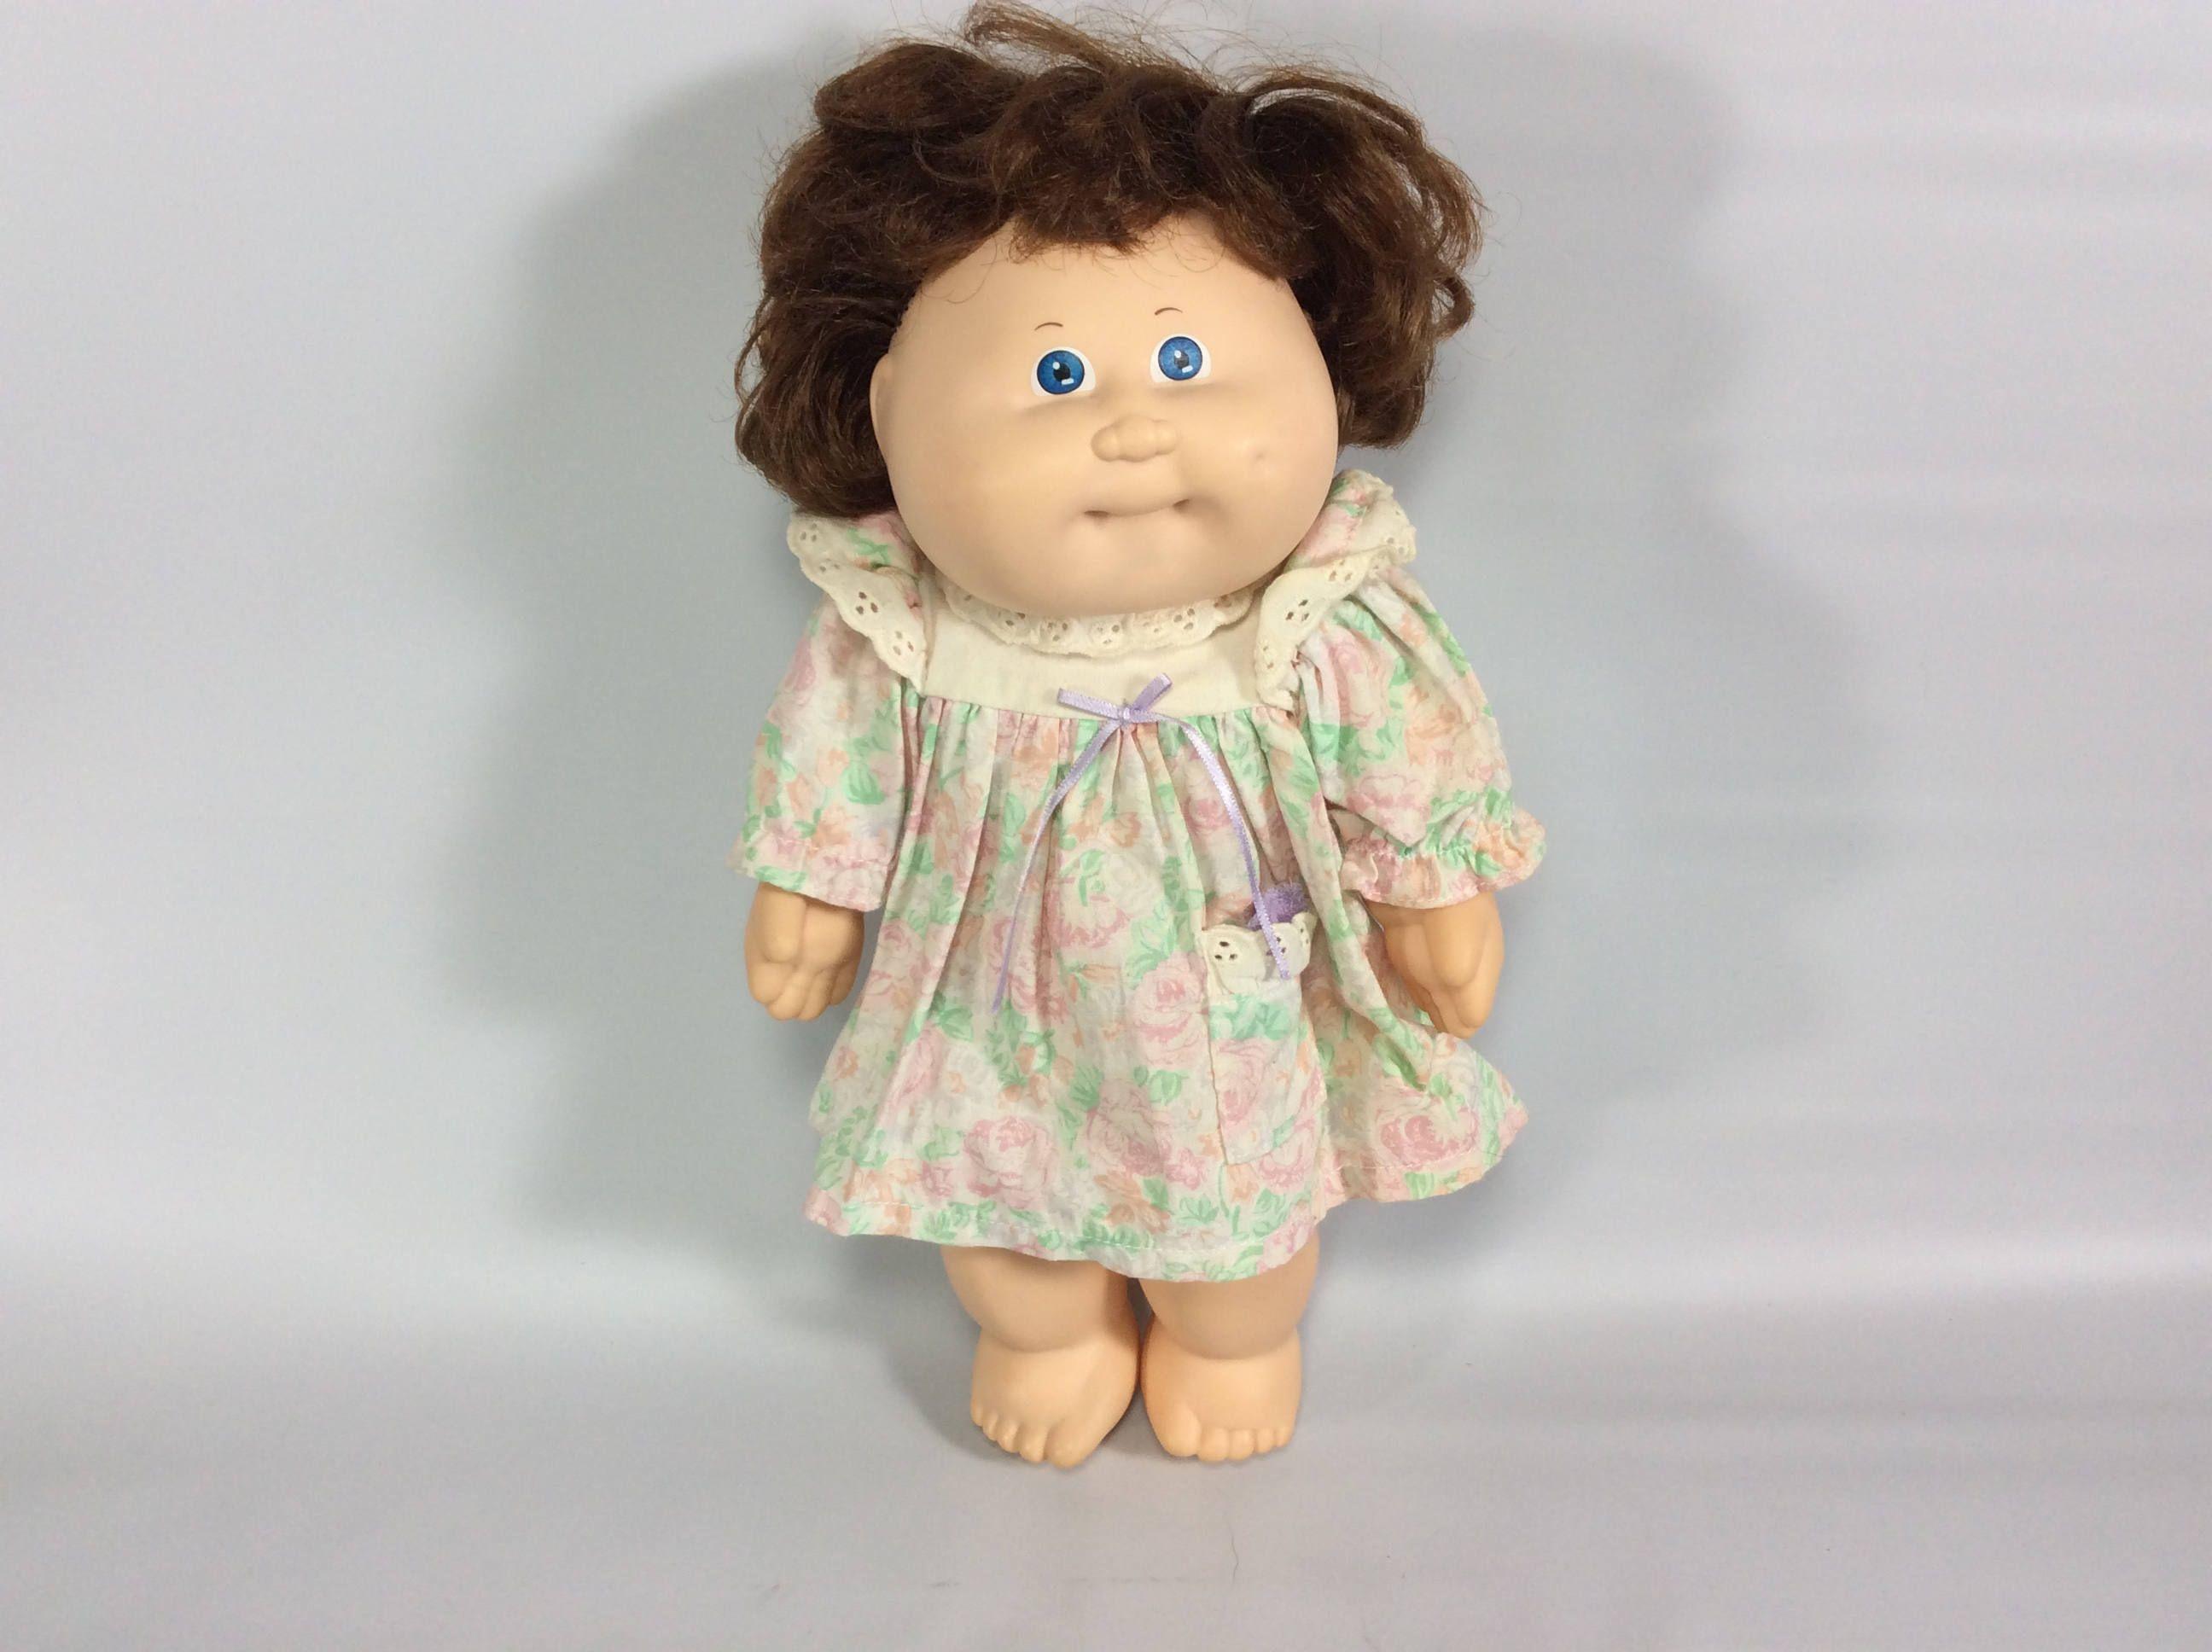 Cabbage Patch Kid Doll Vinyl Aqua Signature 1987 Girl Blue Etsy Cabbage Patch Kids Dolls Cabbage Patch Kids Brown Hair Blue Eyes